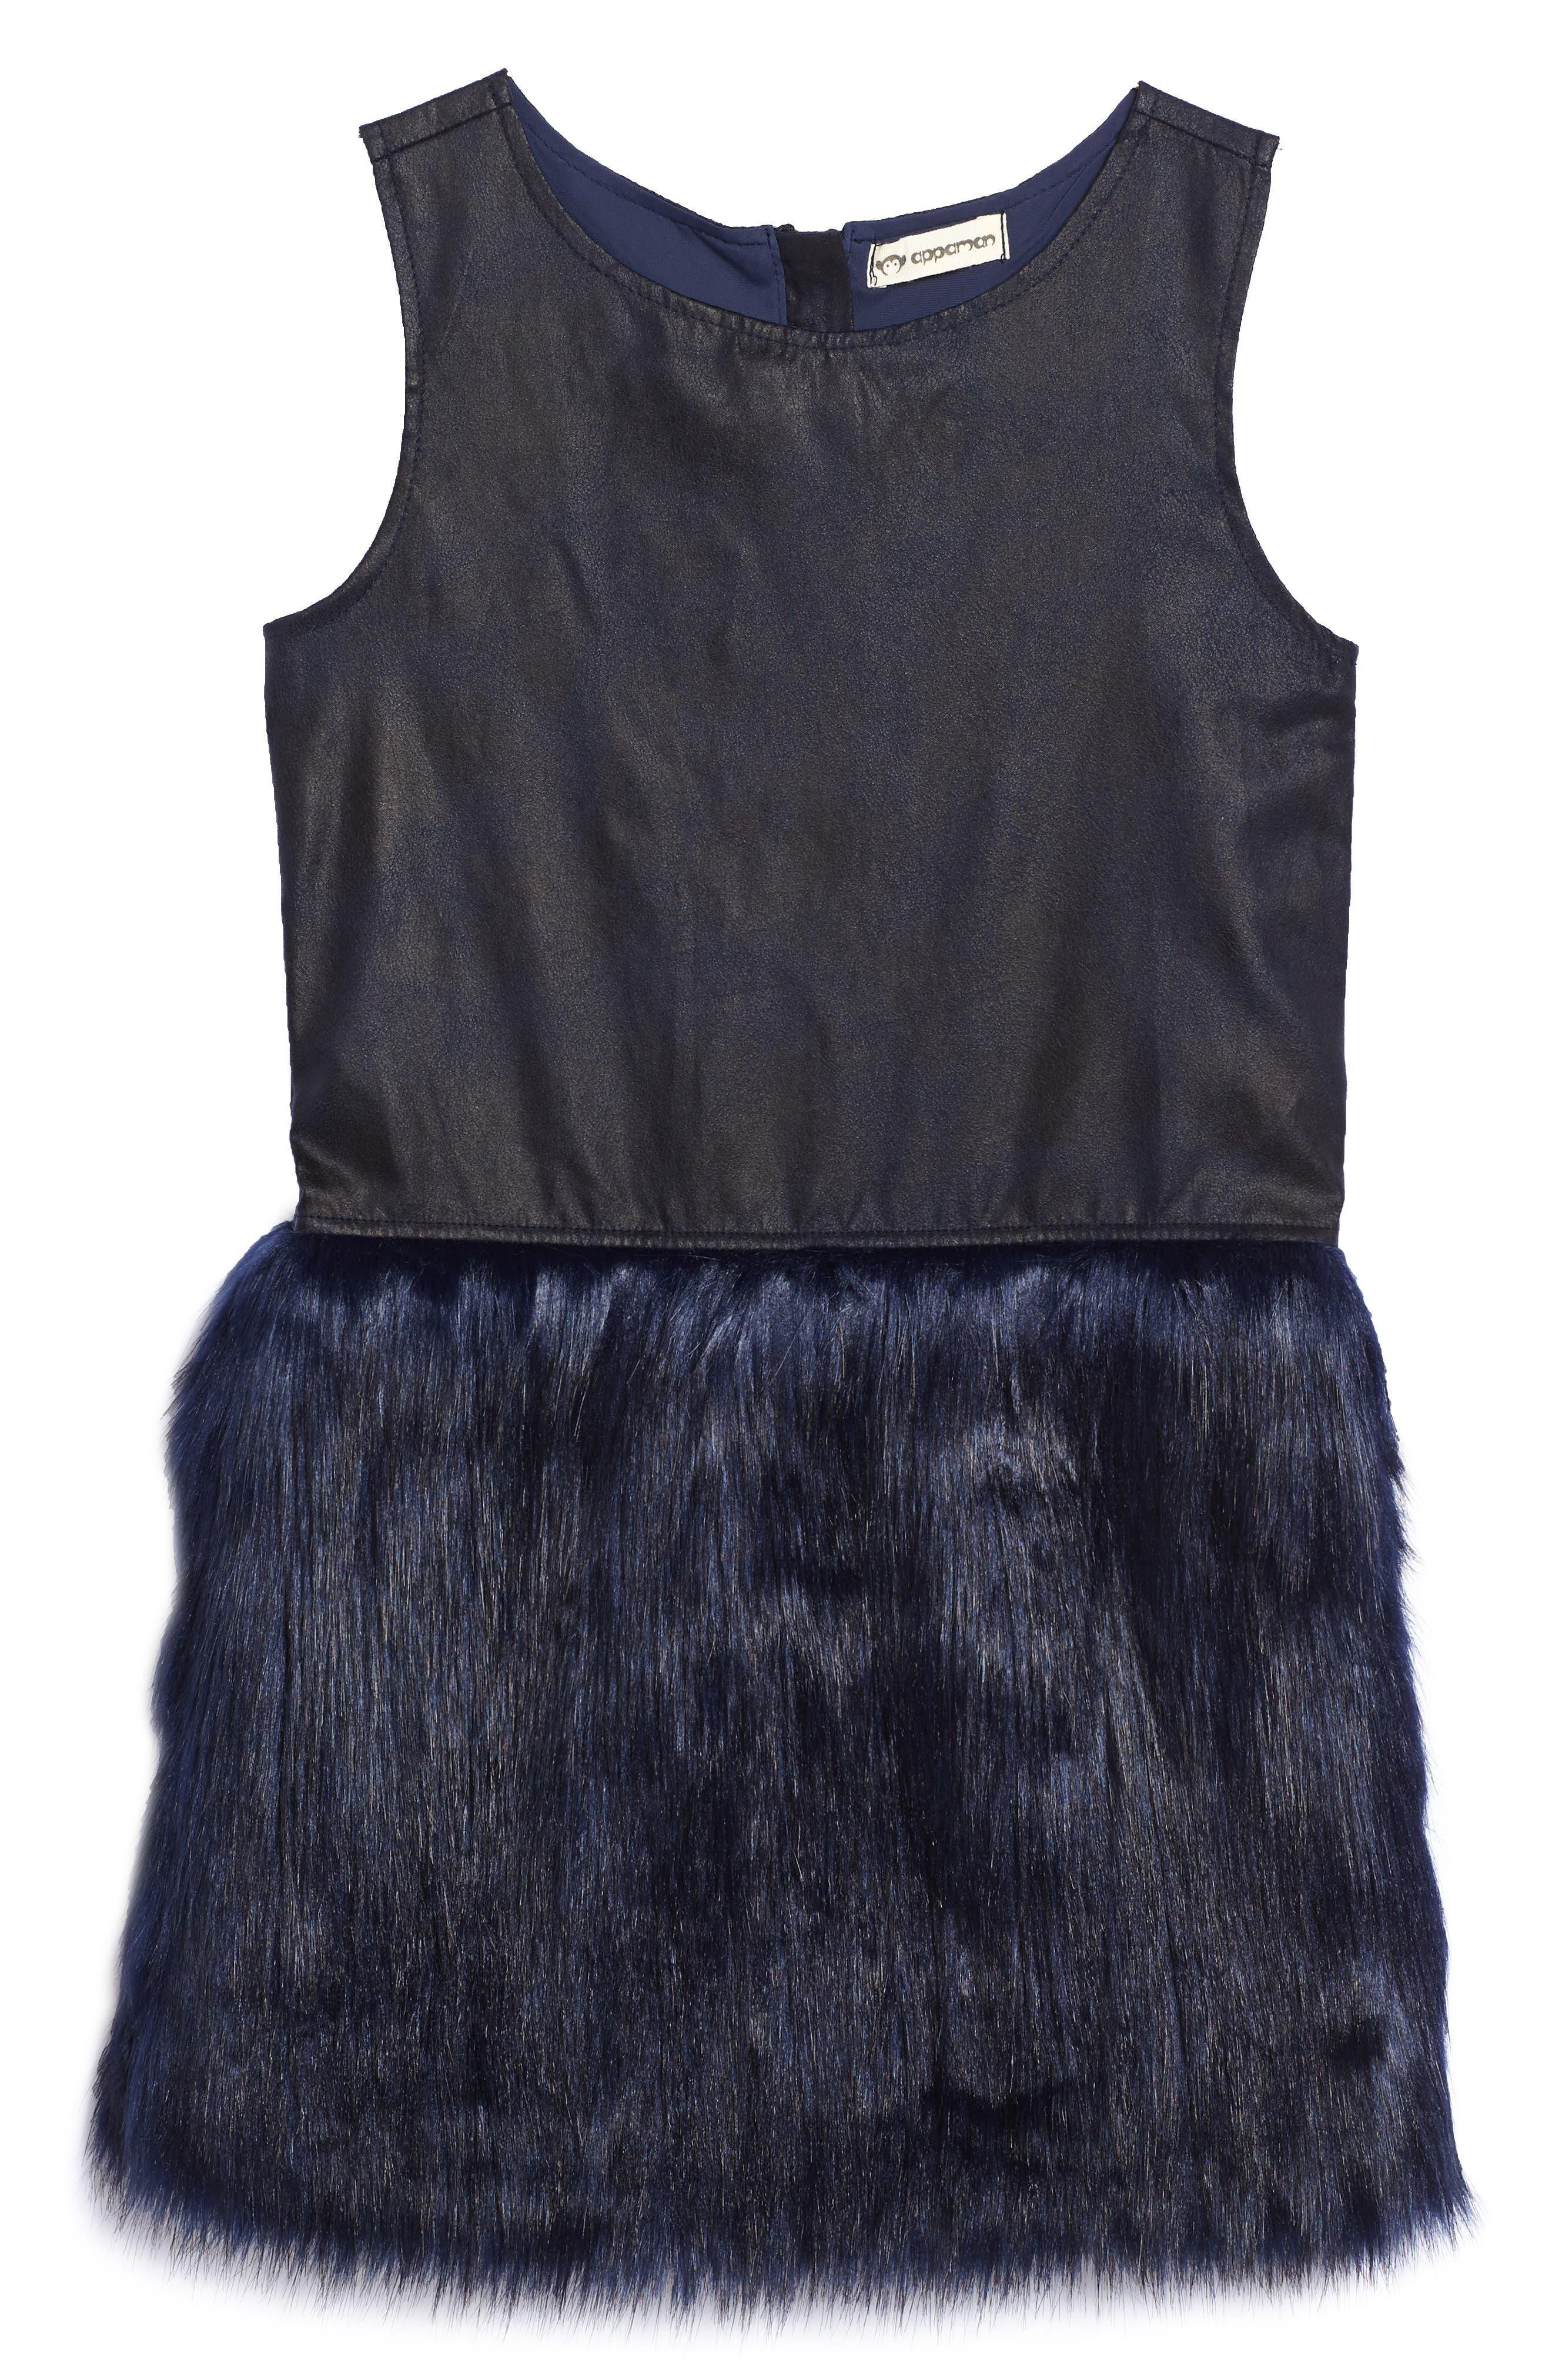 Alternate Image 1 Selected - Appaman Eve Faux Fur Dress (Toddler Girls, Little Girls & Big Girls)